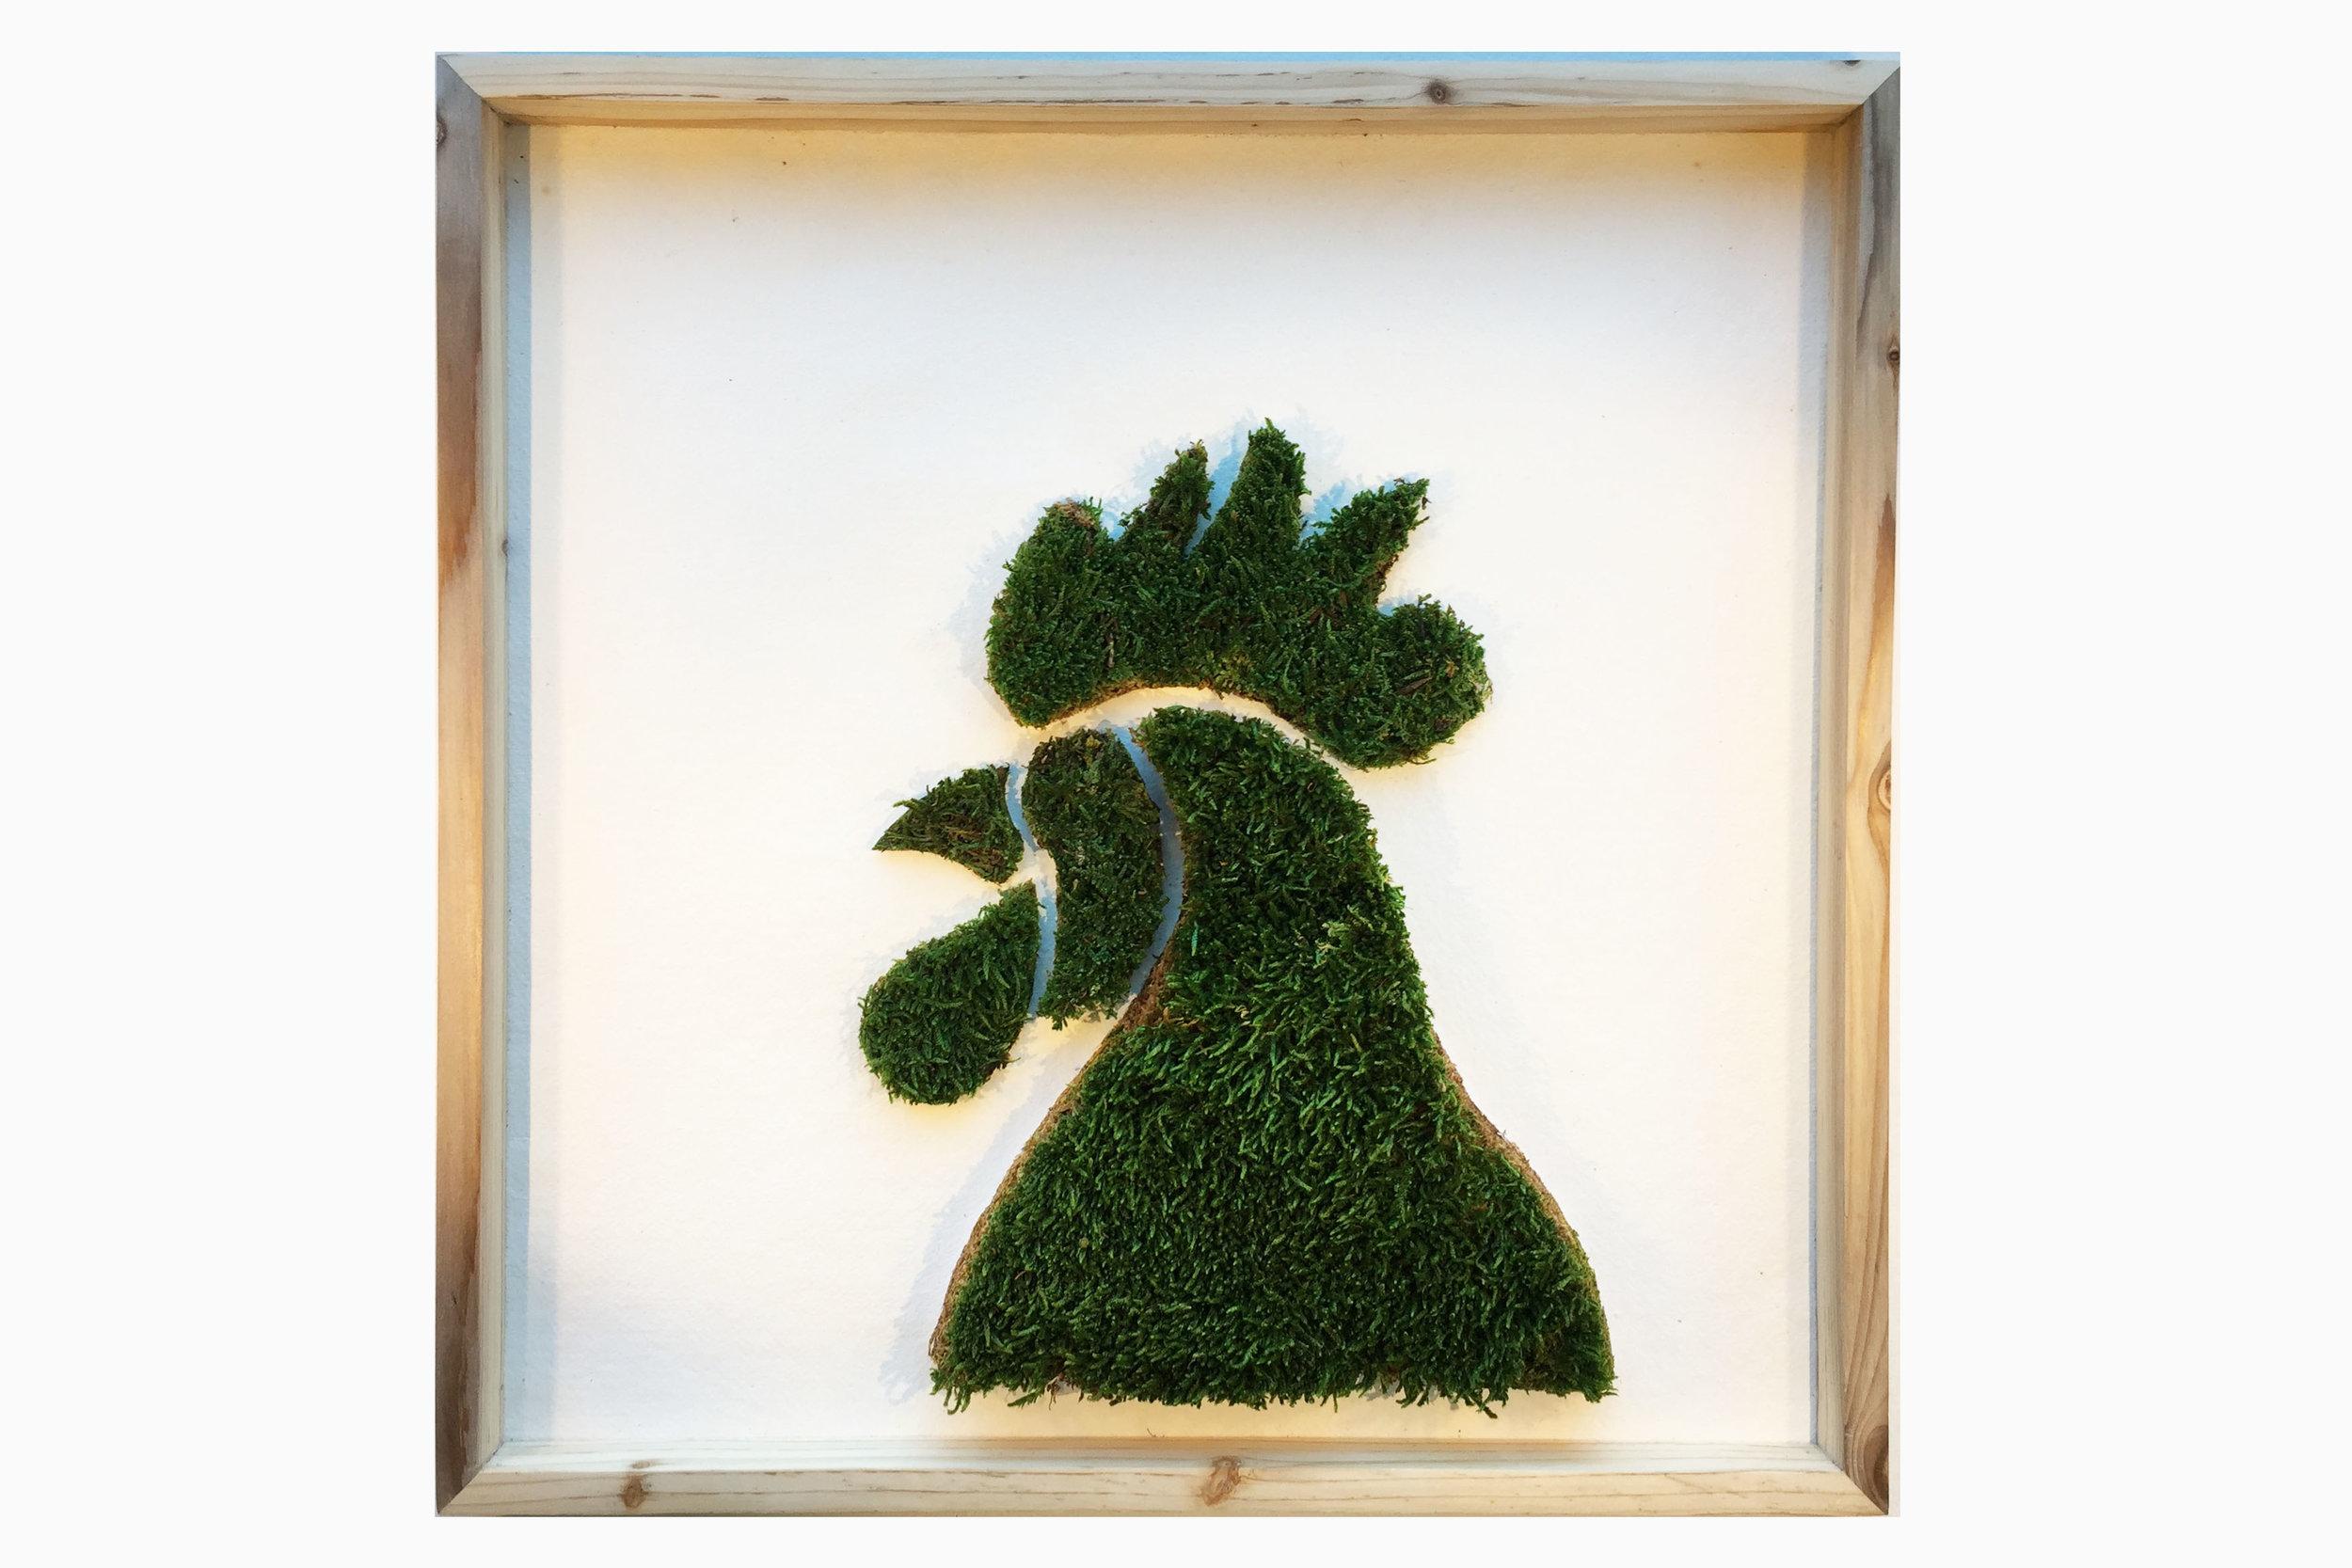 cadre-vegetal-coq-hoai.jpg